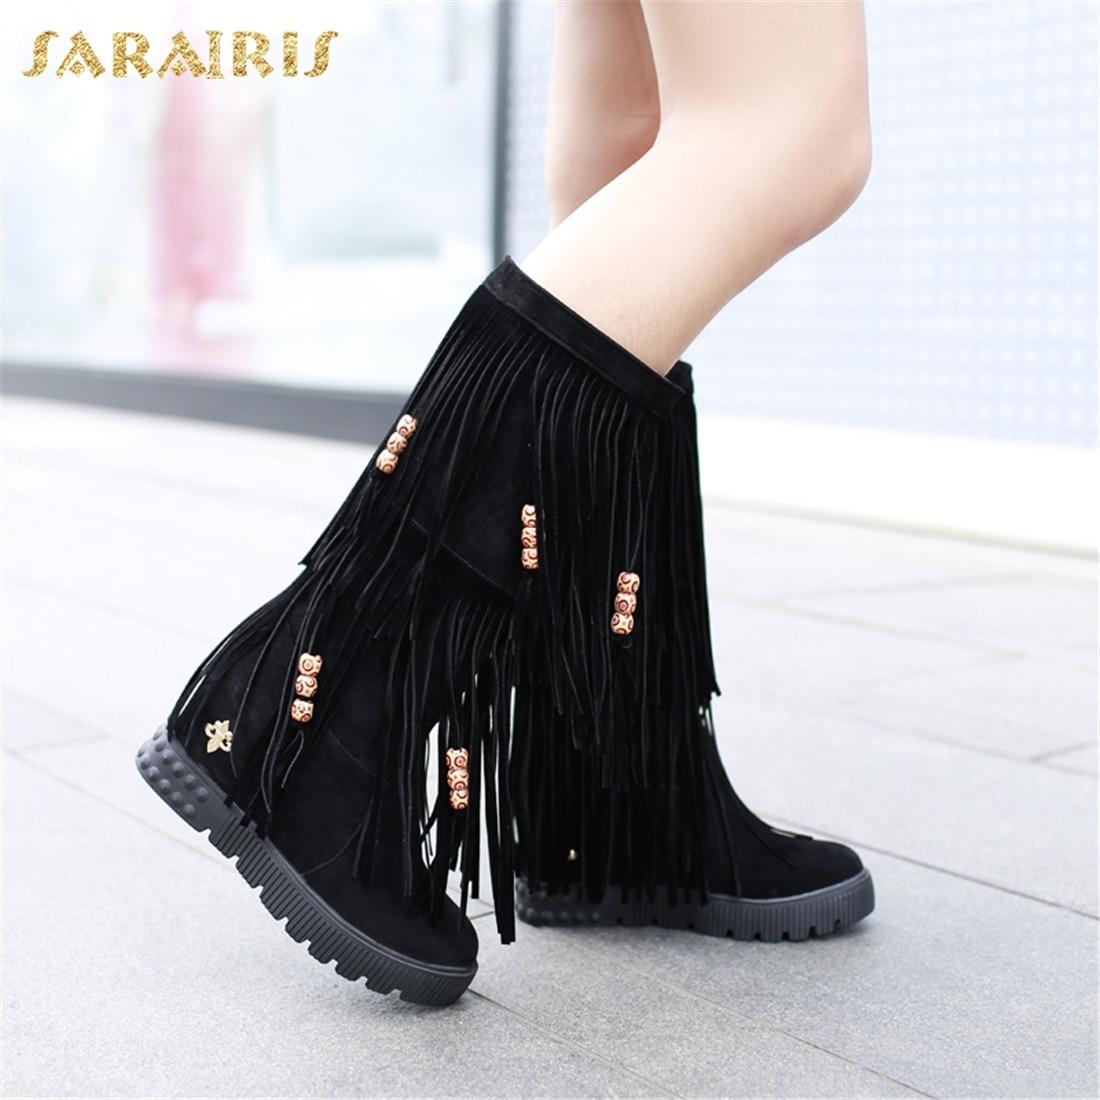 03724530 34 Zapatos Media negro Tacones Botas Plus On Aumento Mujer Sarairis De  Pantorrilla Size Moda marrón ...